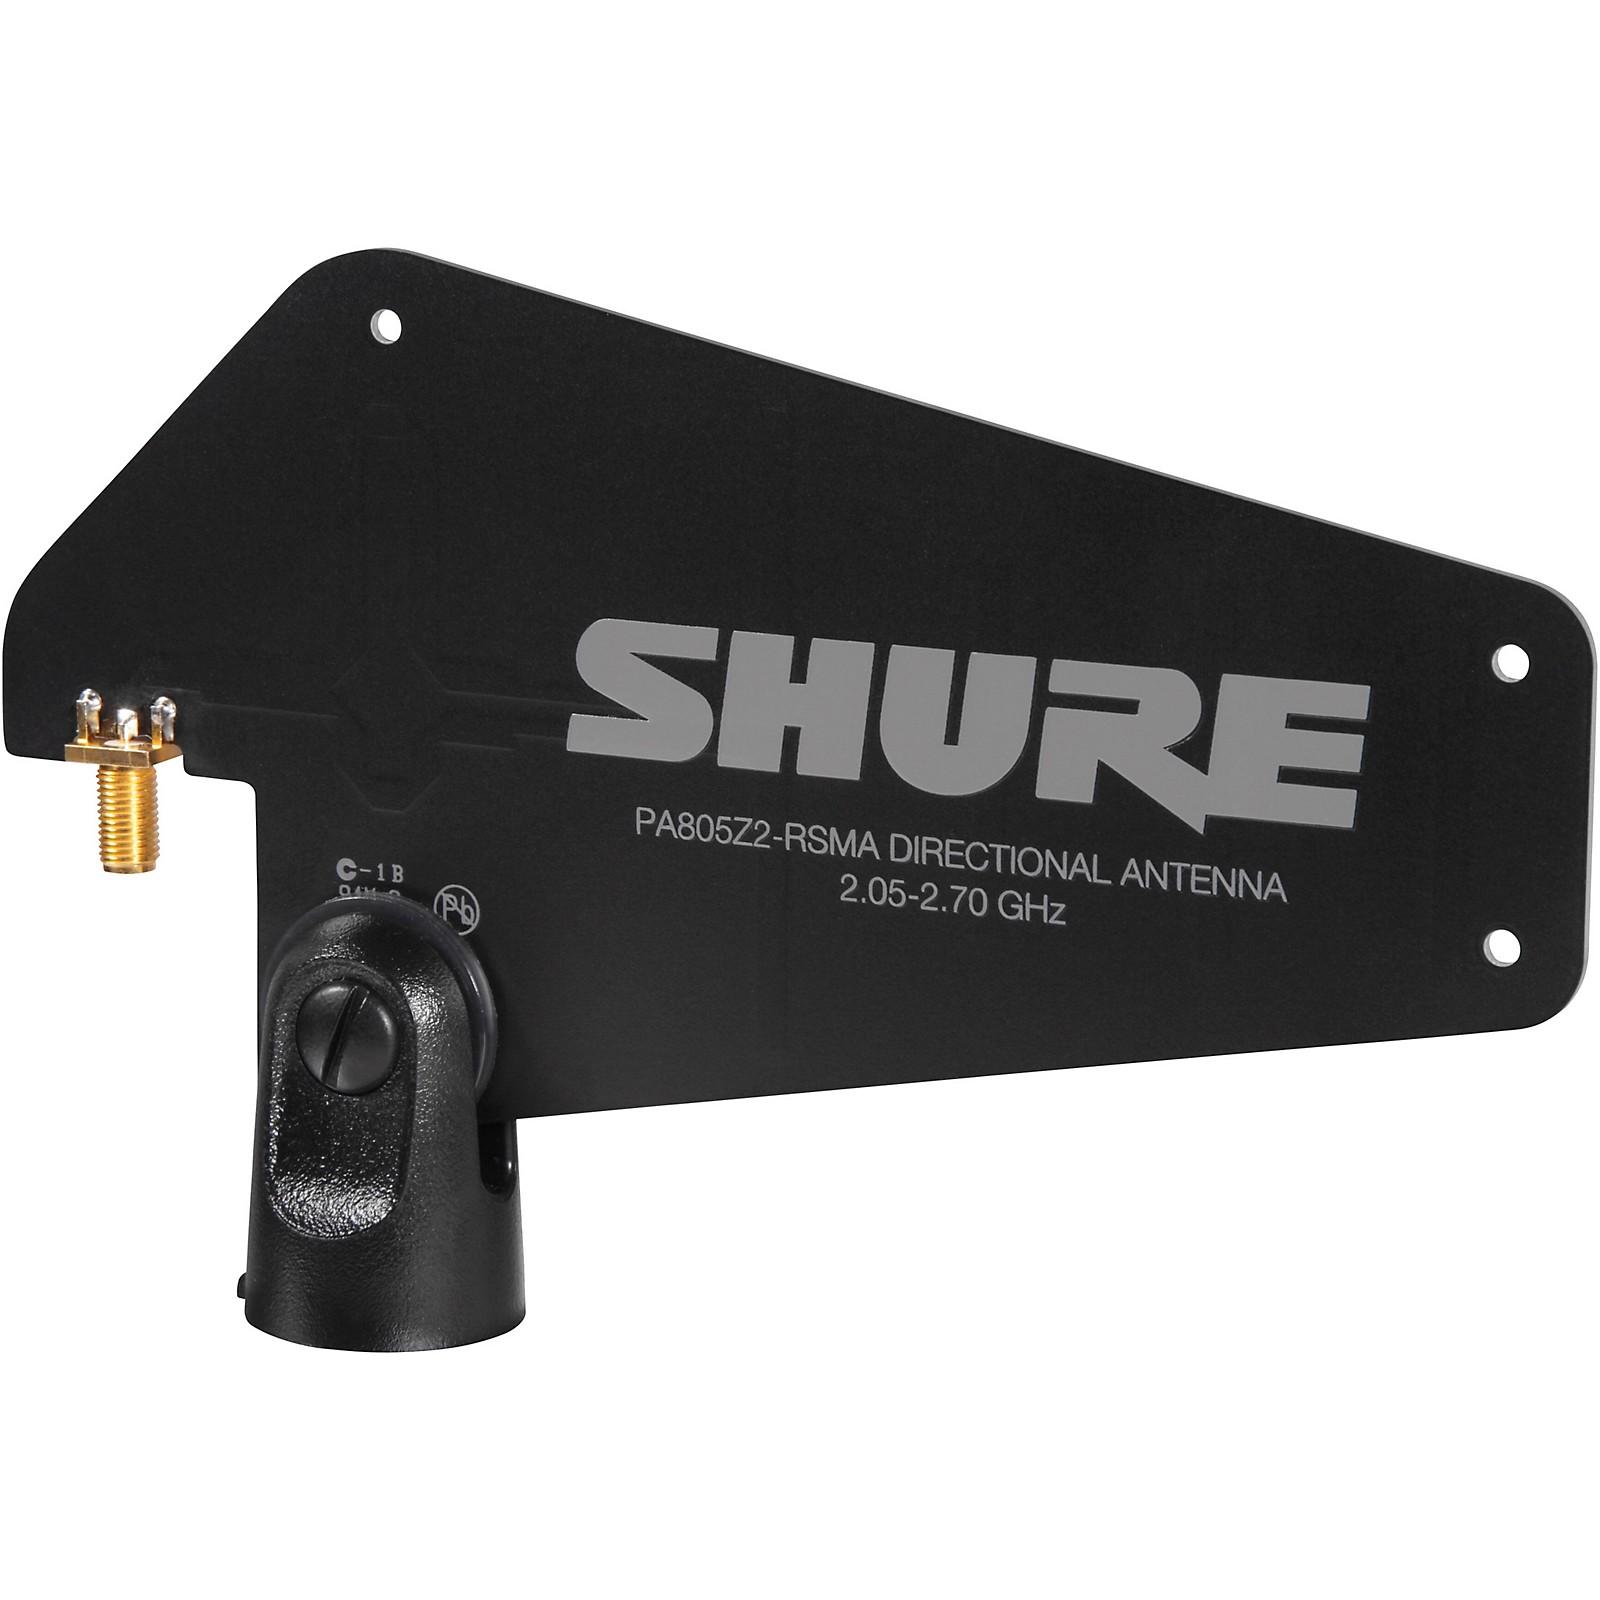 Open Box Shure PA805-RSMA Passive Directional Wireless Antenna for GLX-D Advanced Digital Wireless Systems